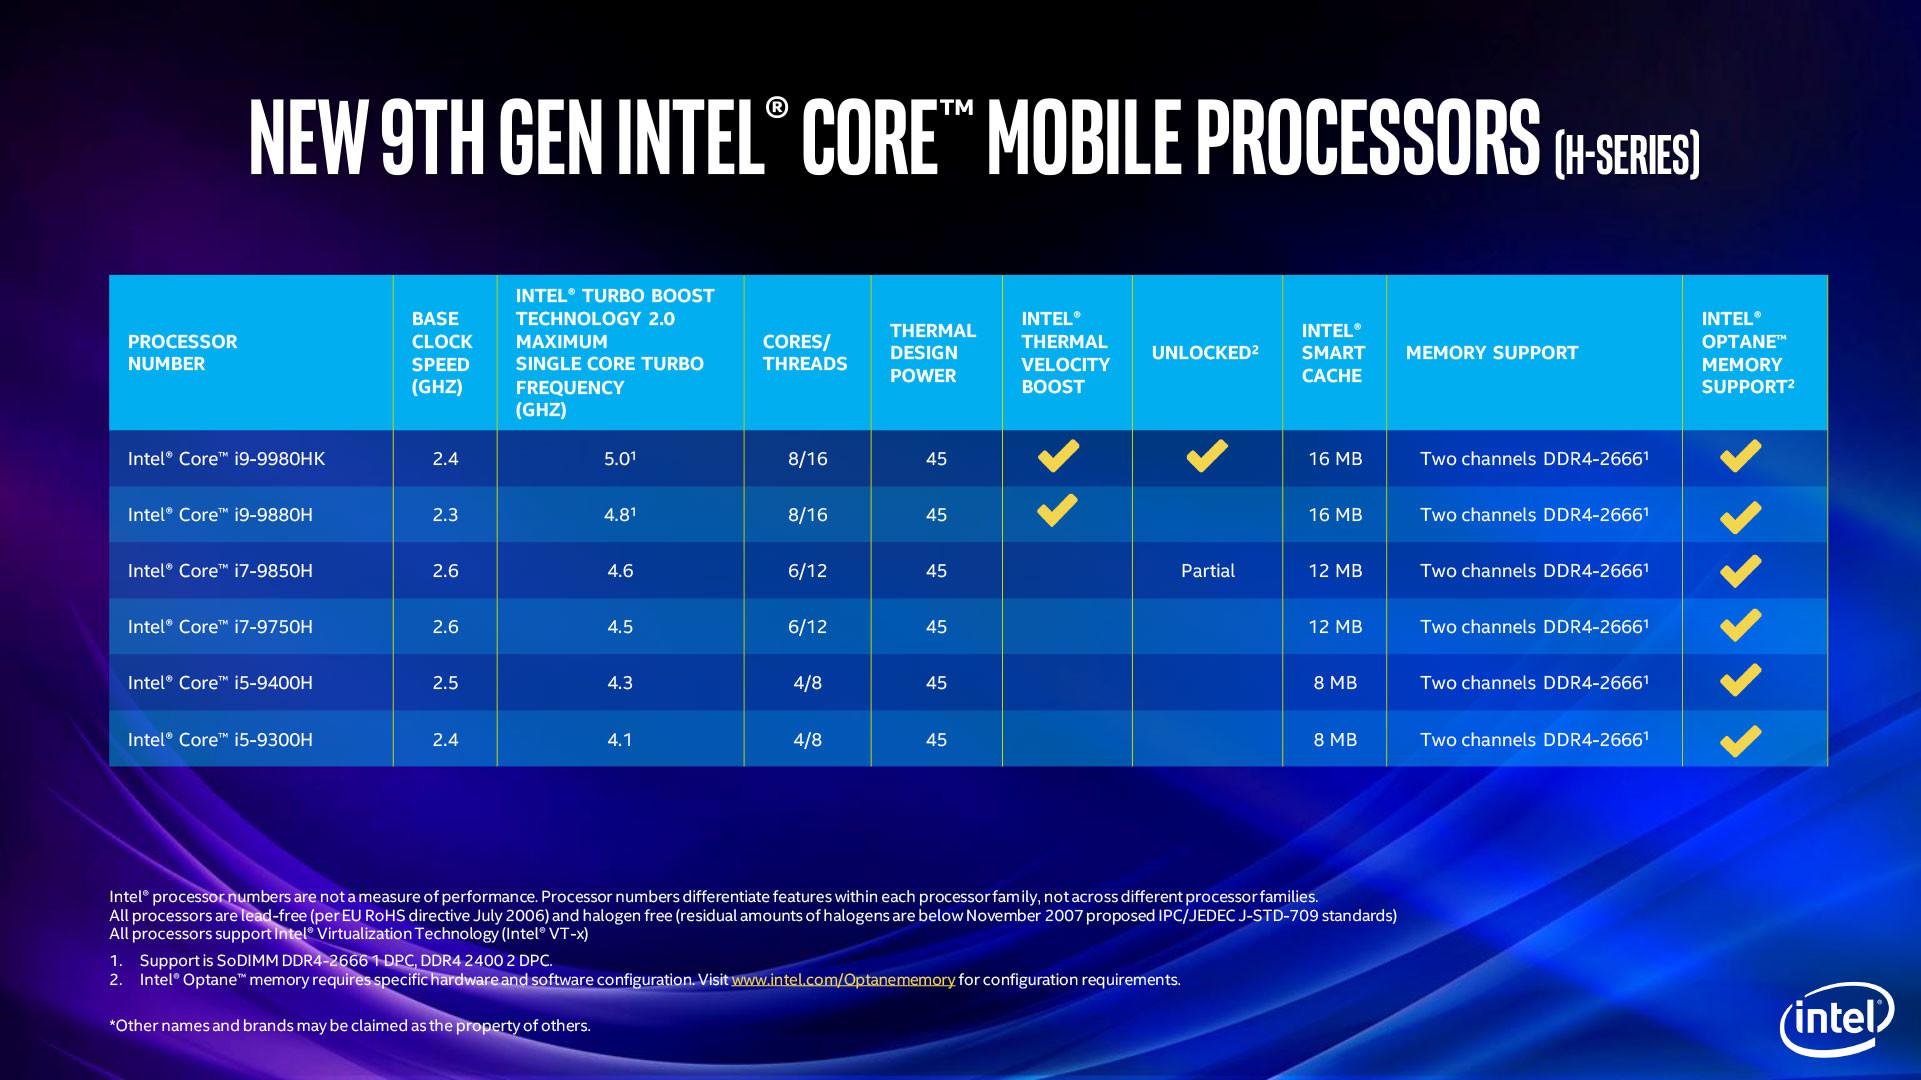 Intel Pamer Jajaran Prosesor Generasi ke-9